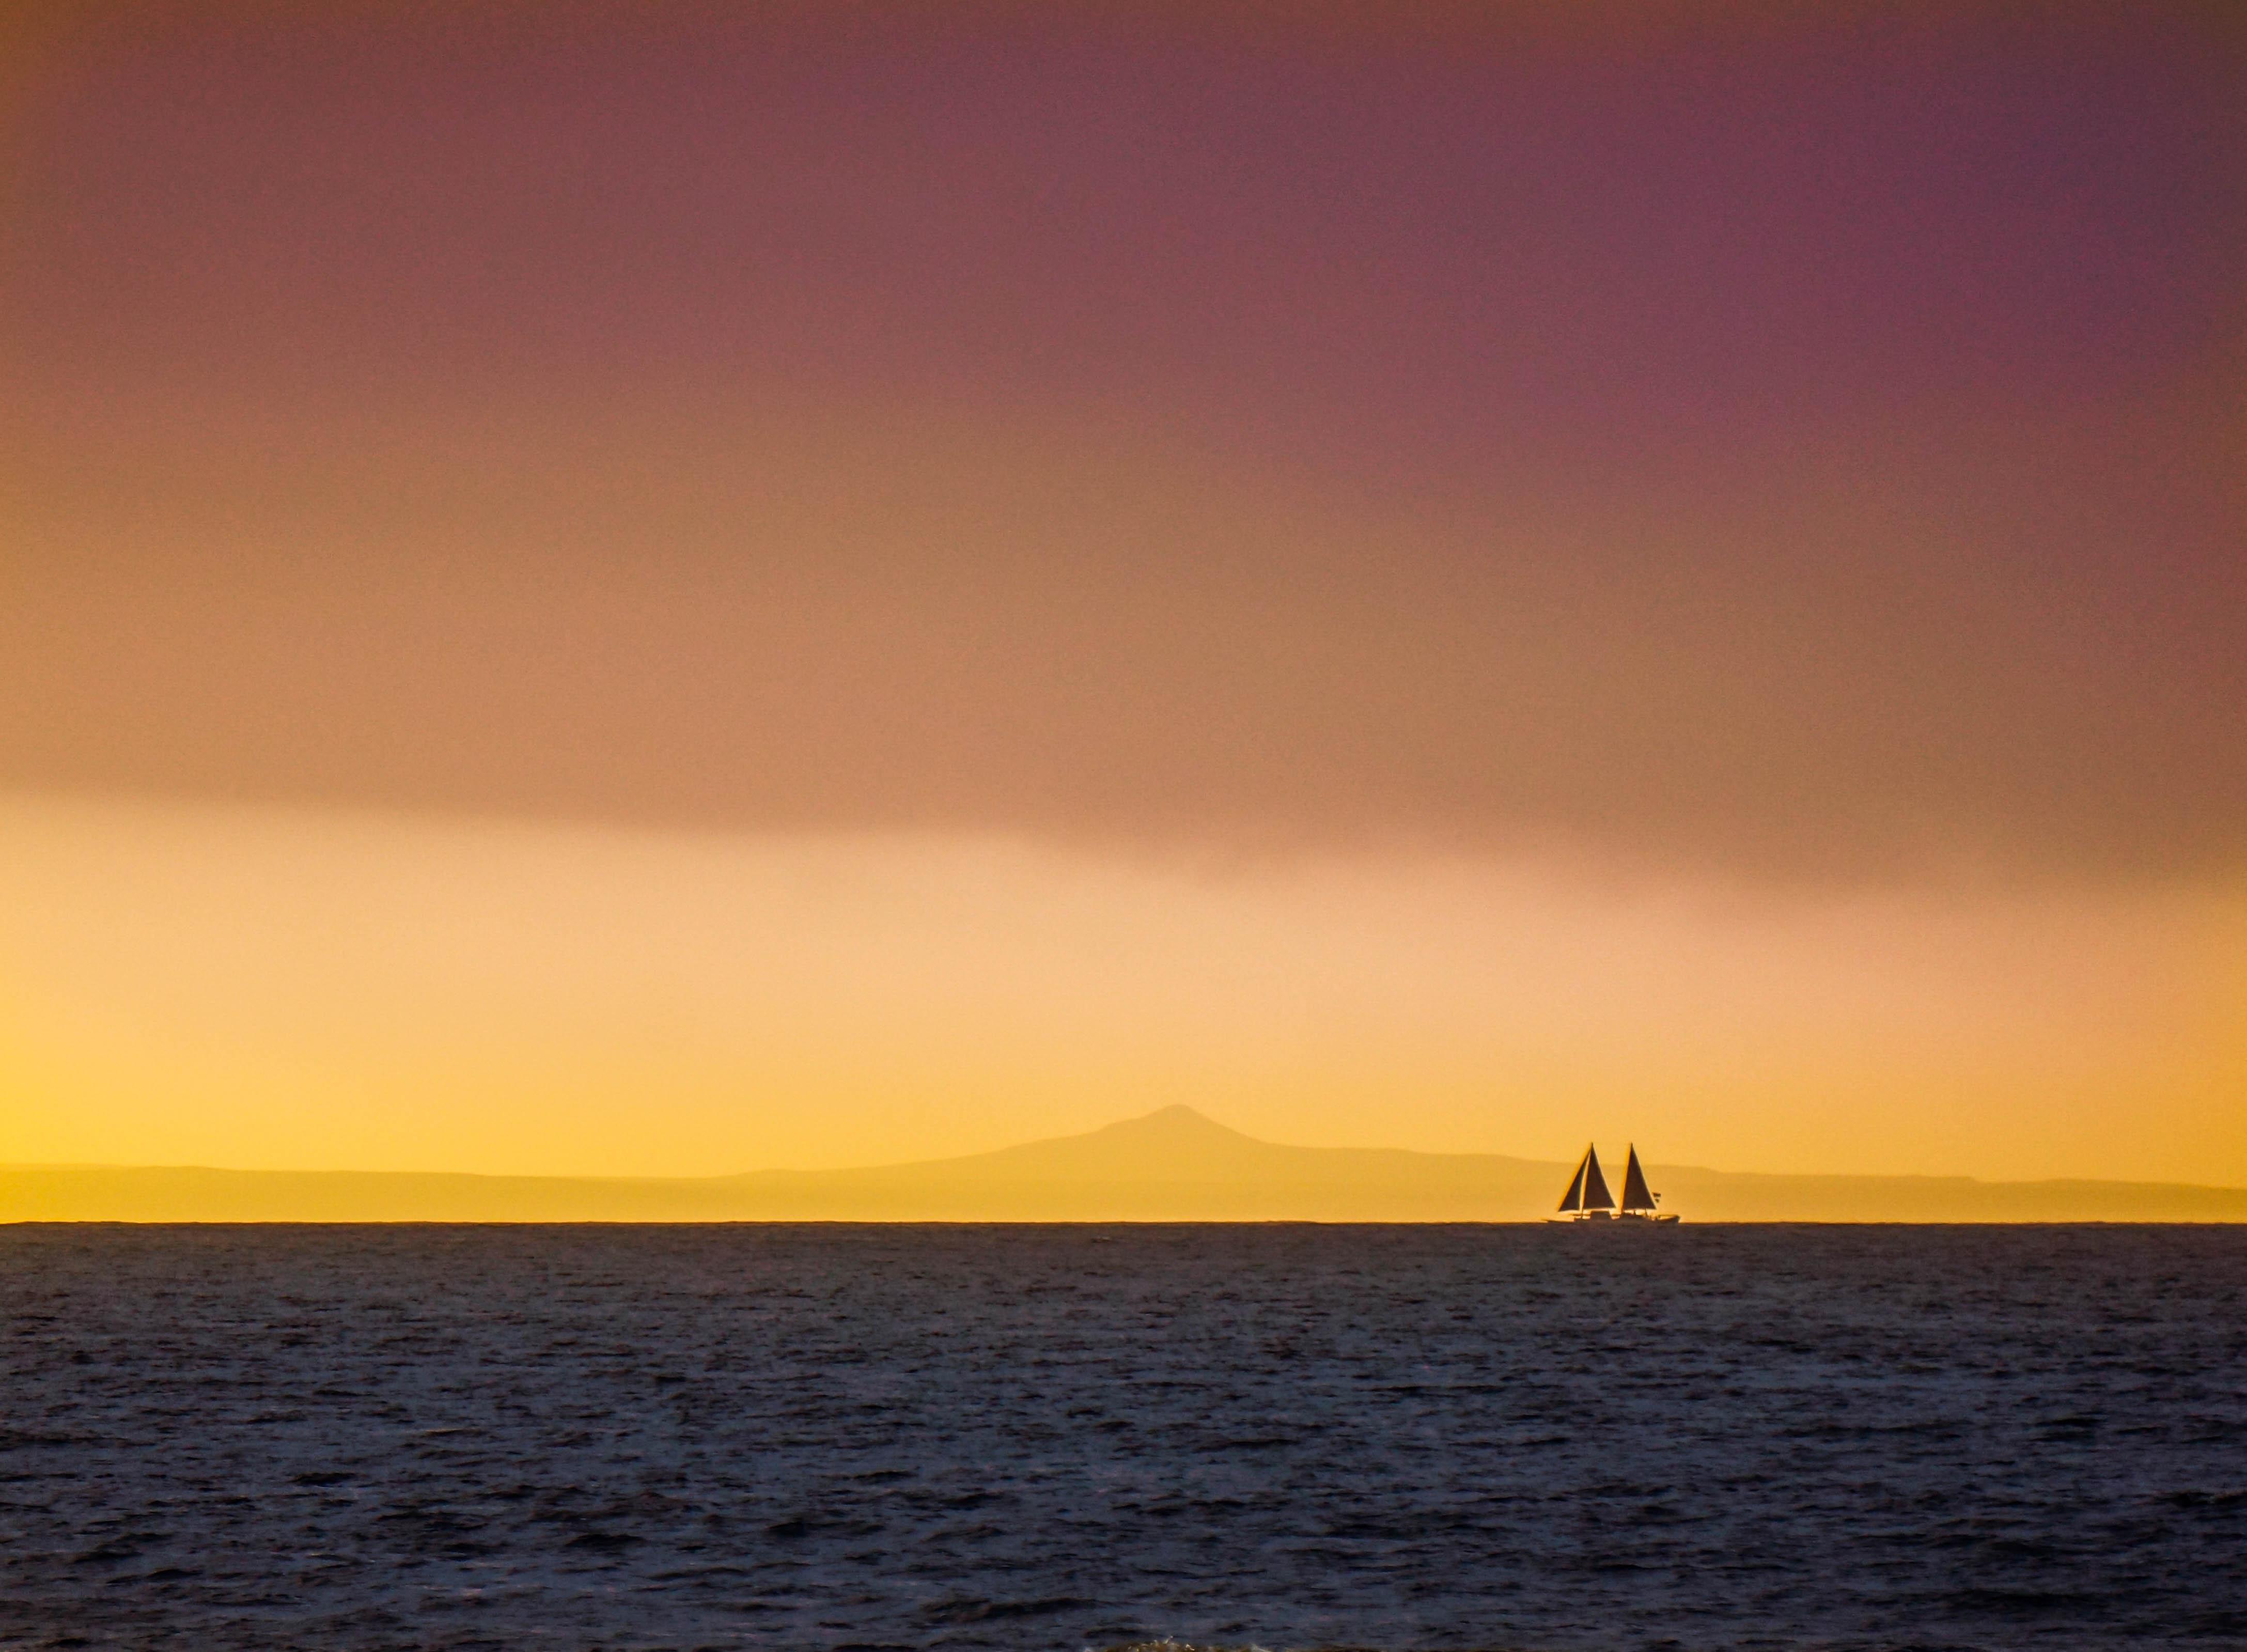 Volcano Waka